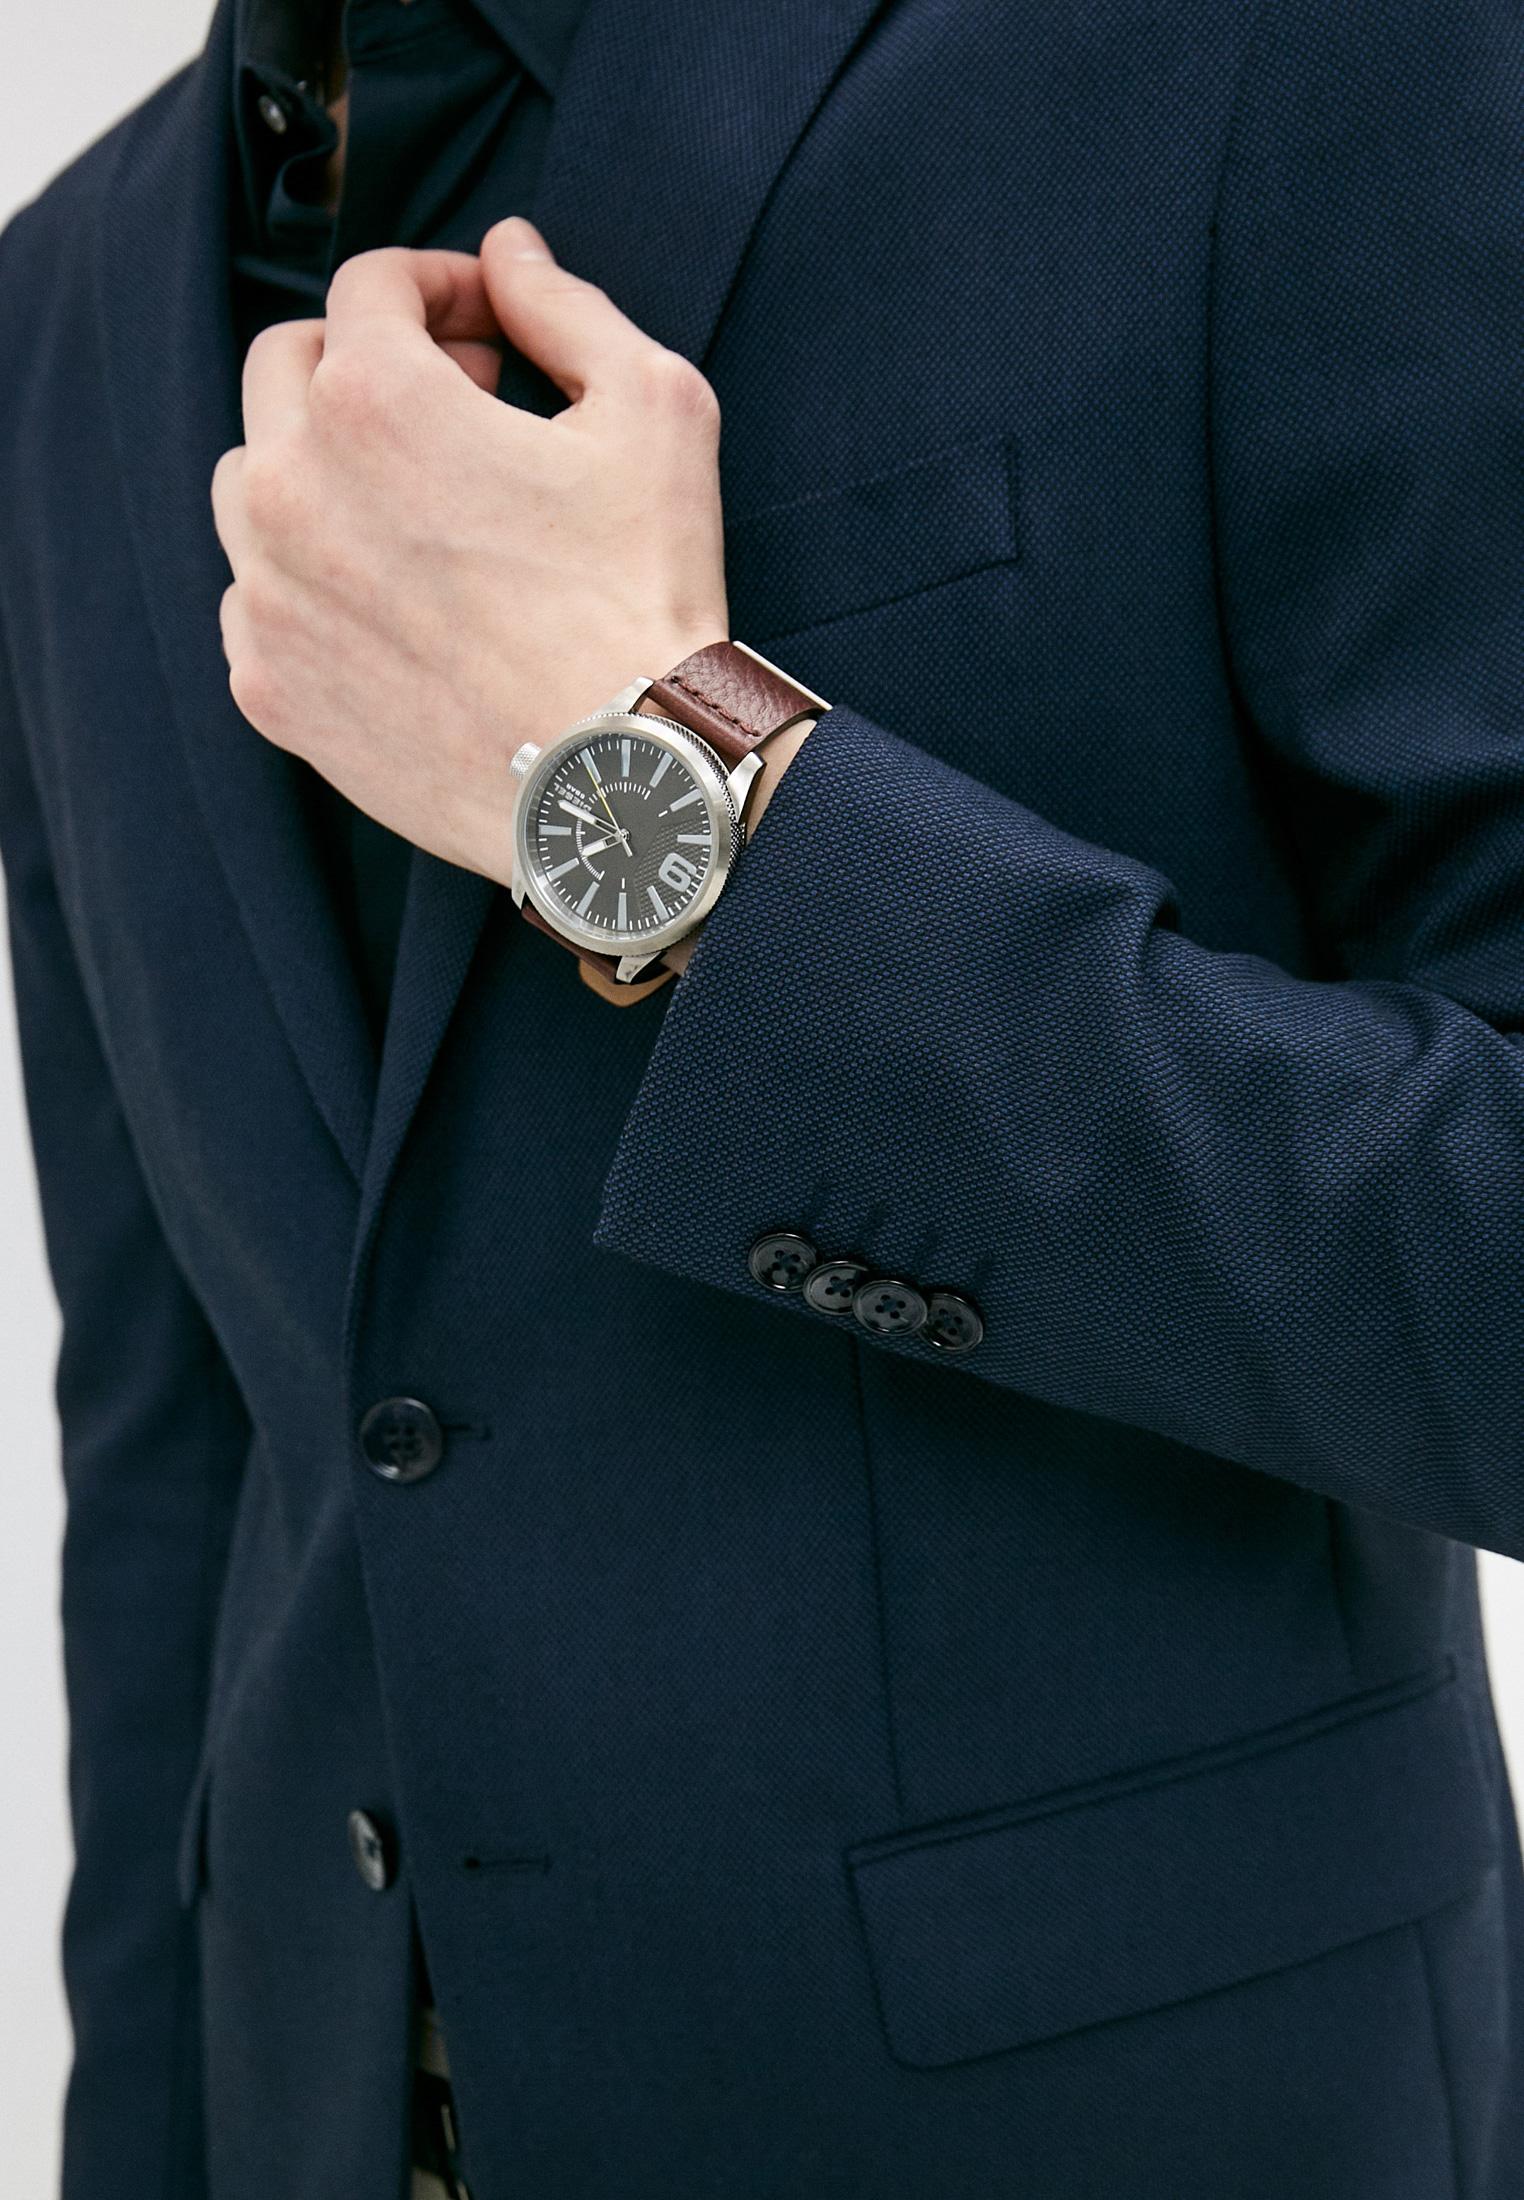 Мужские часы Diesel (Дизель) DZ1802